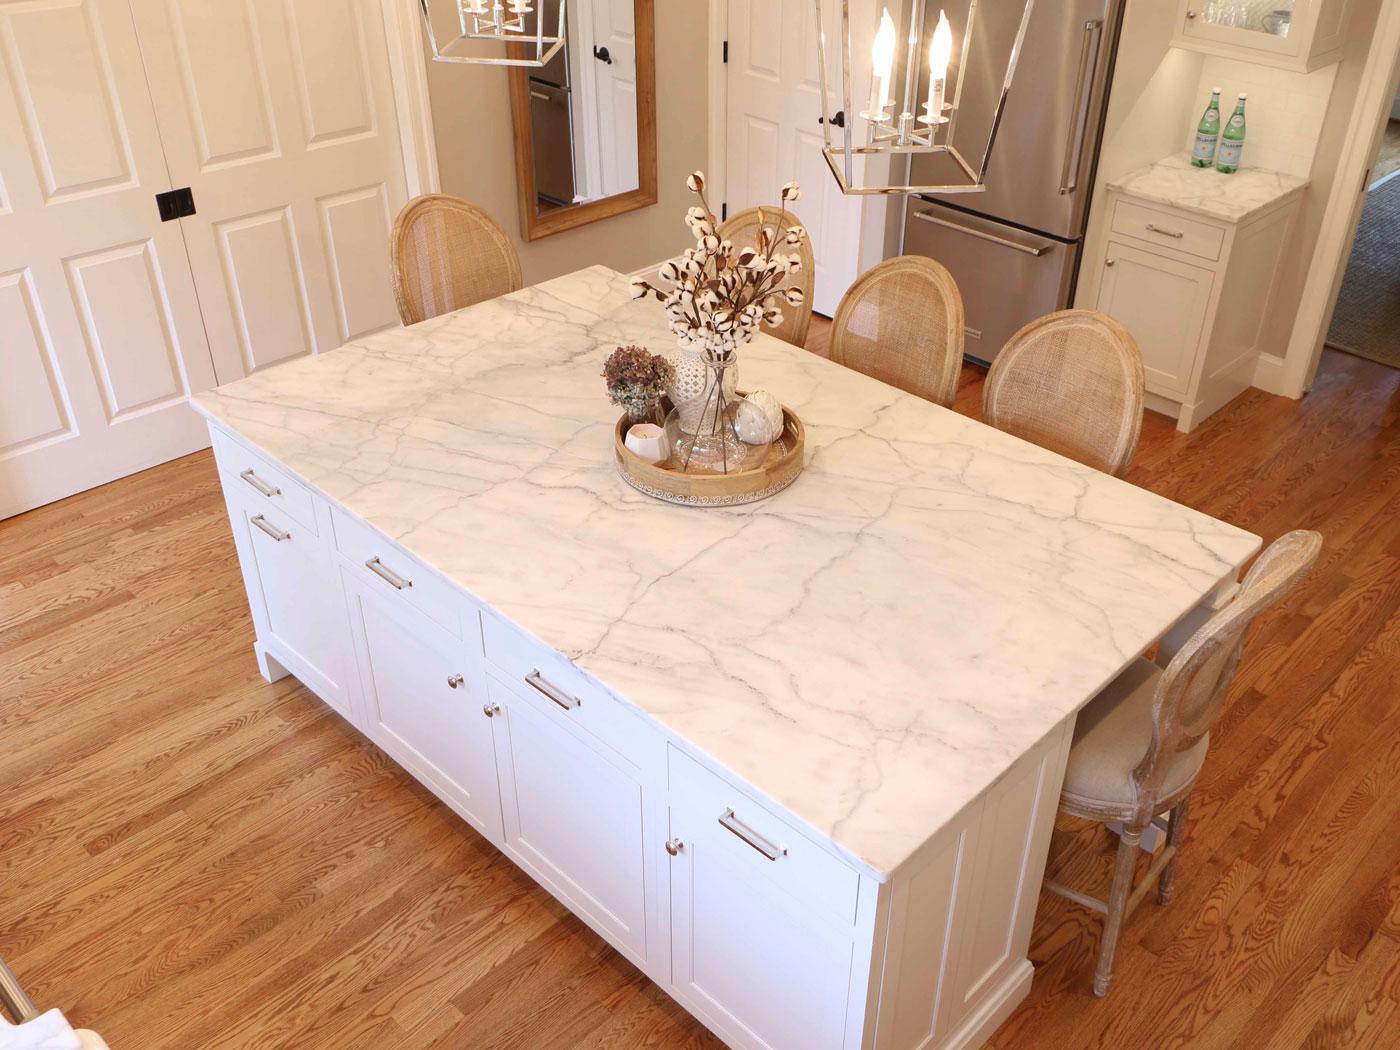 Carrara Marble Countertops Why I Chose Them